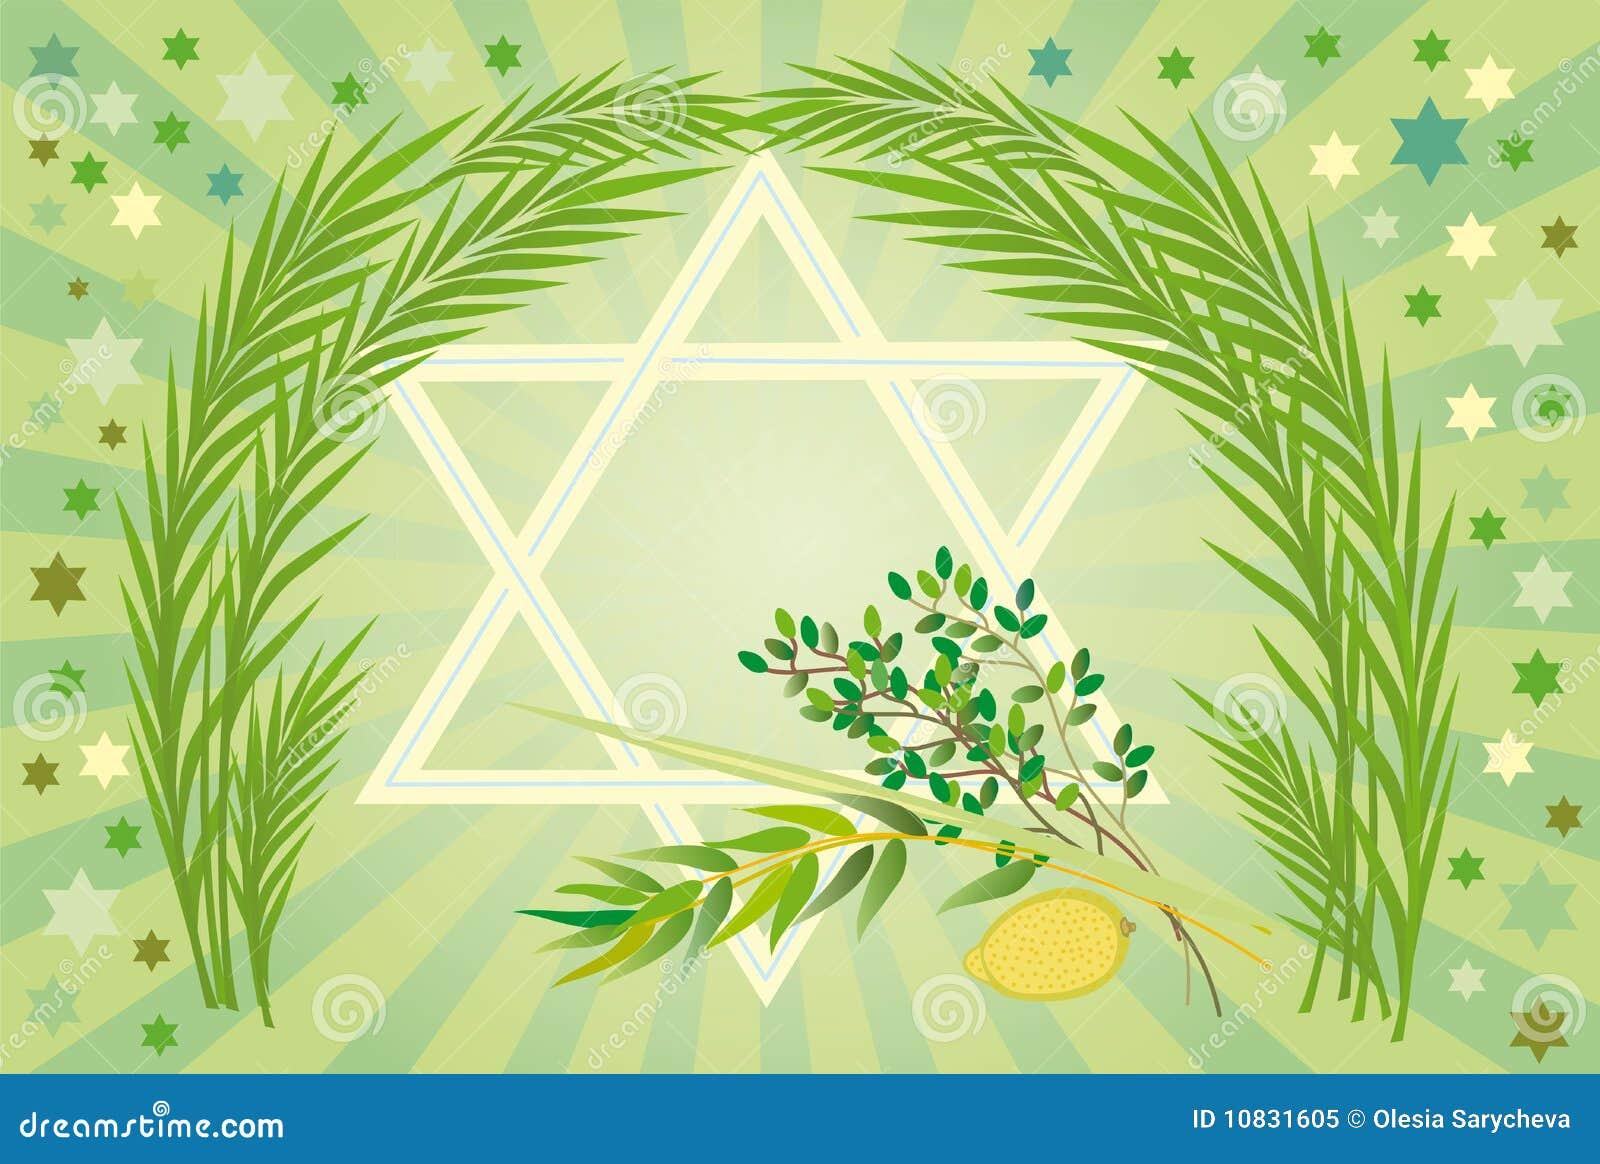 Jewish Holiday Of Sukkot Holiday Royalty Free Stock Photo - Image ...